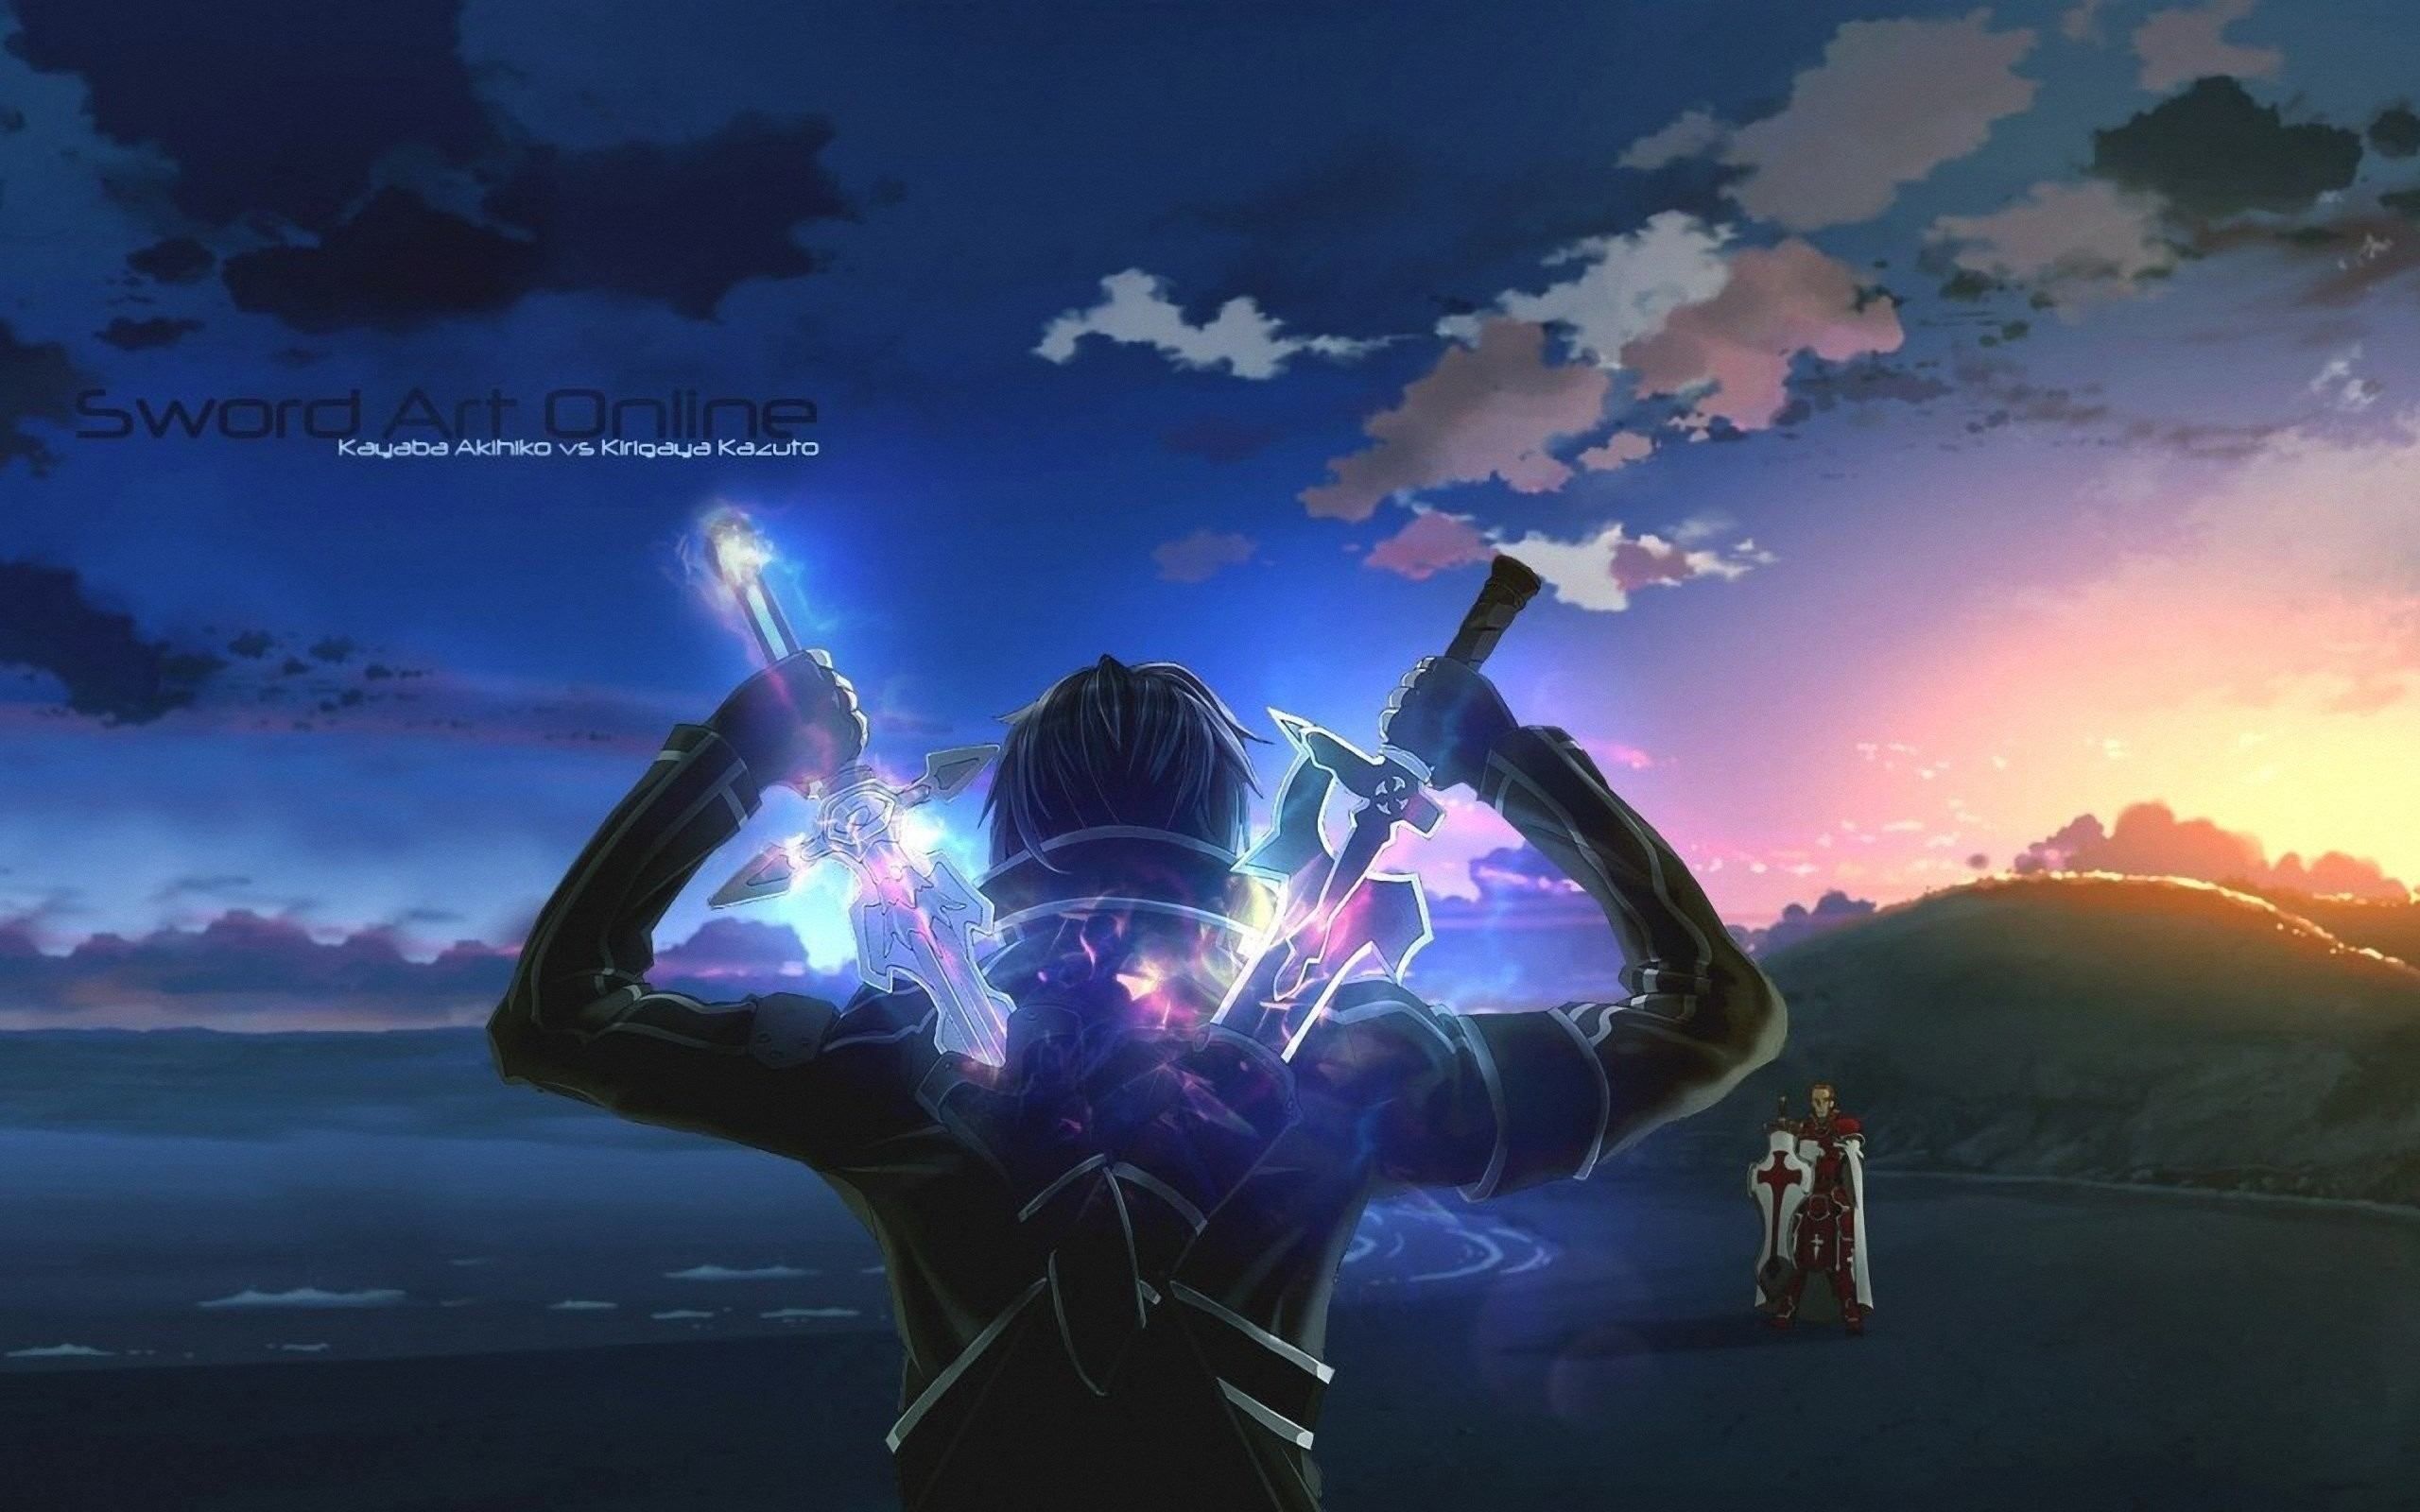 Wallpapers Sword Art Online HD 4K – Taringa!